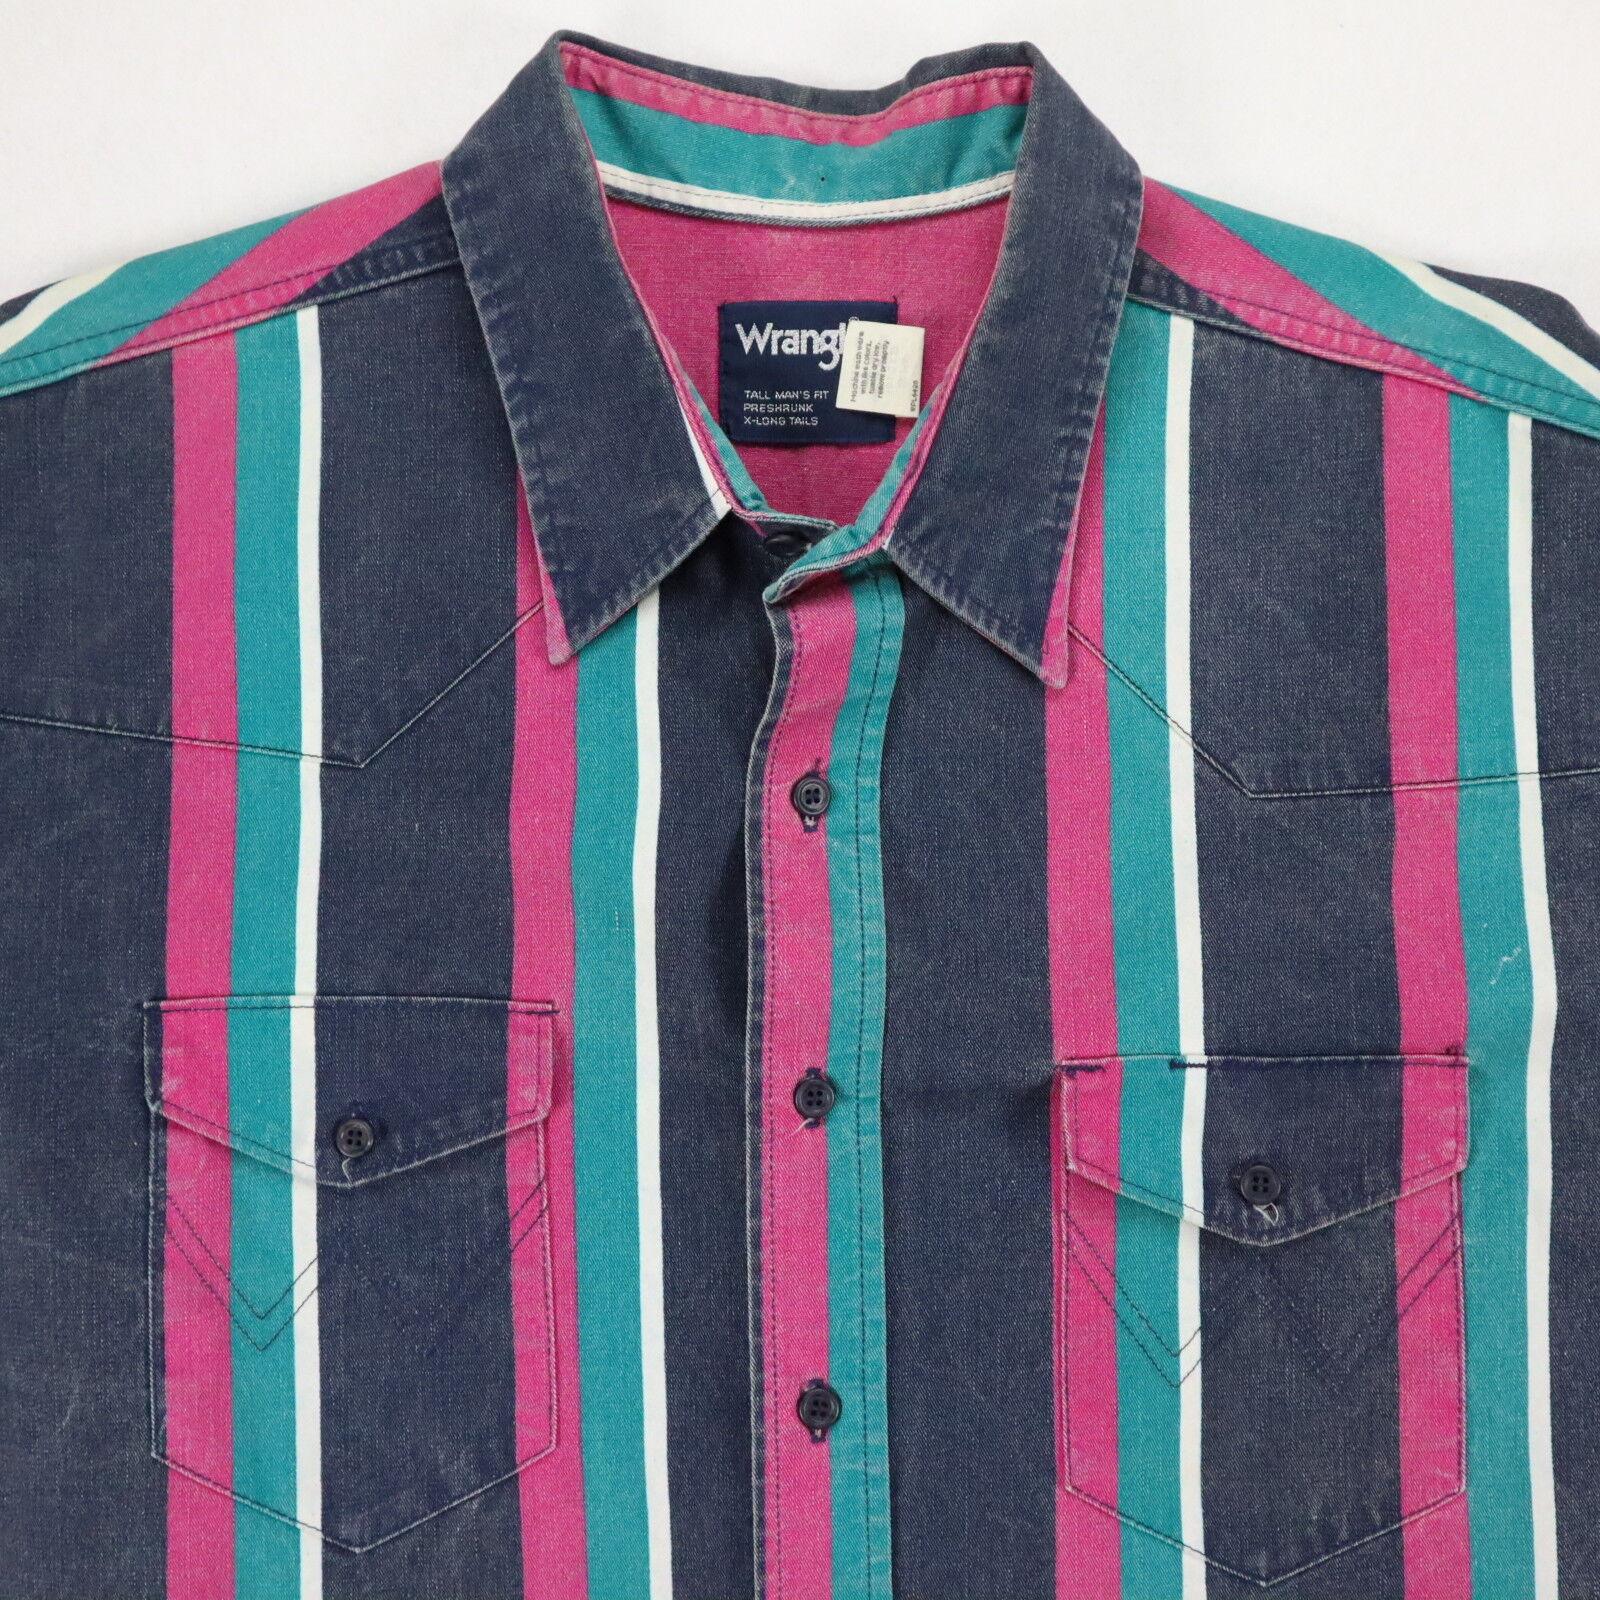 Vtg Wrangler Western Denim Shirt Mens size 2XLT Tall Striped Nicely Faded Cowboy